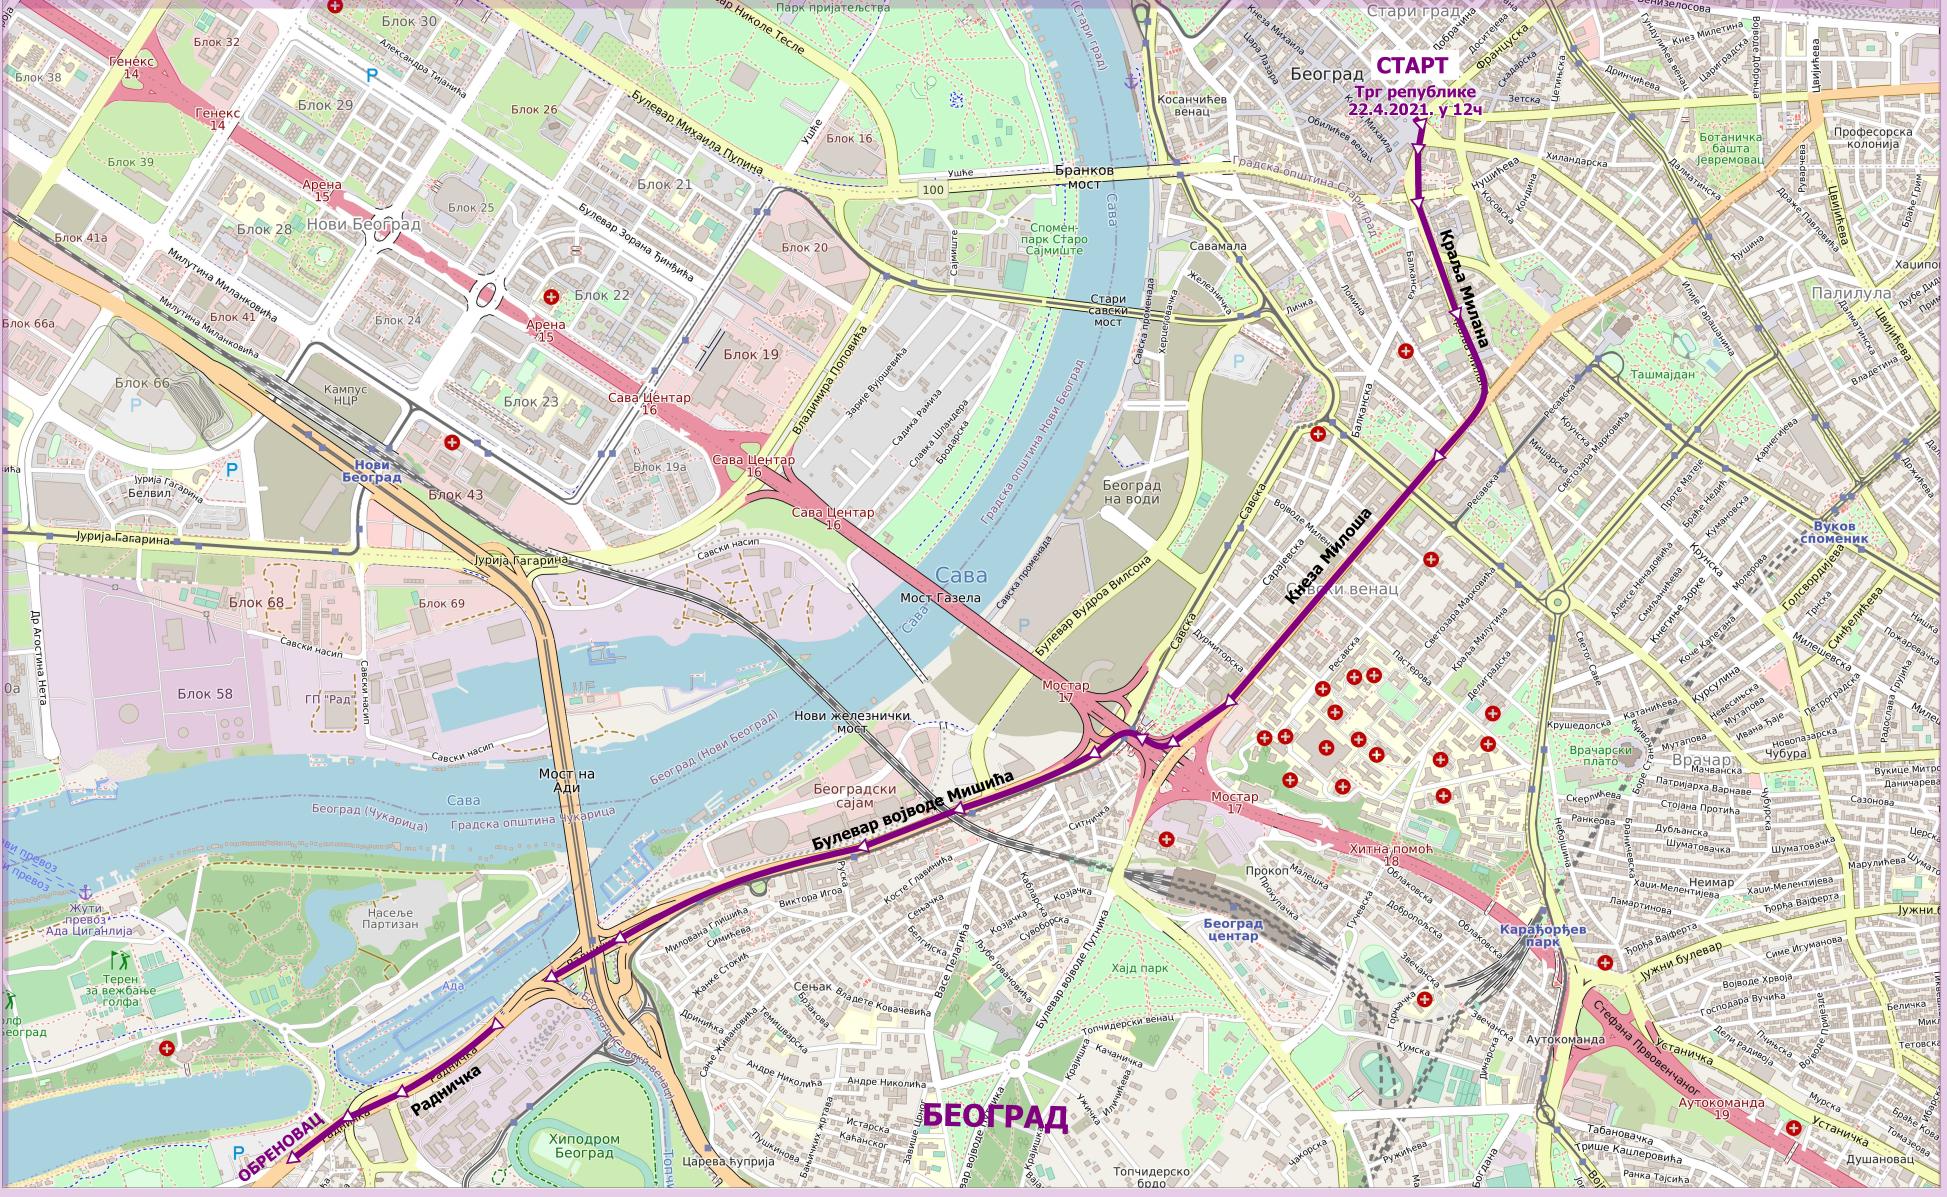 1. етапа Београд